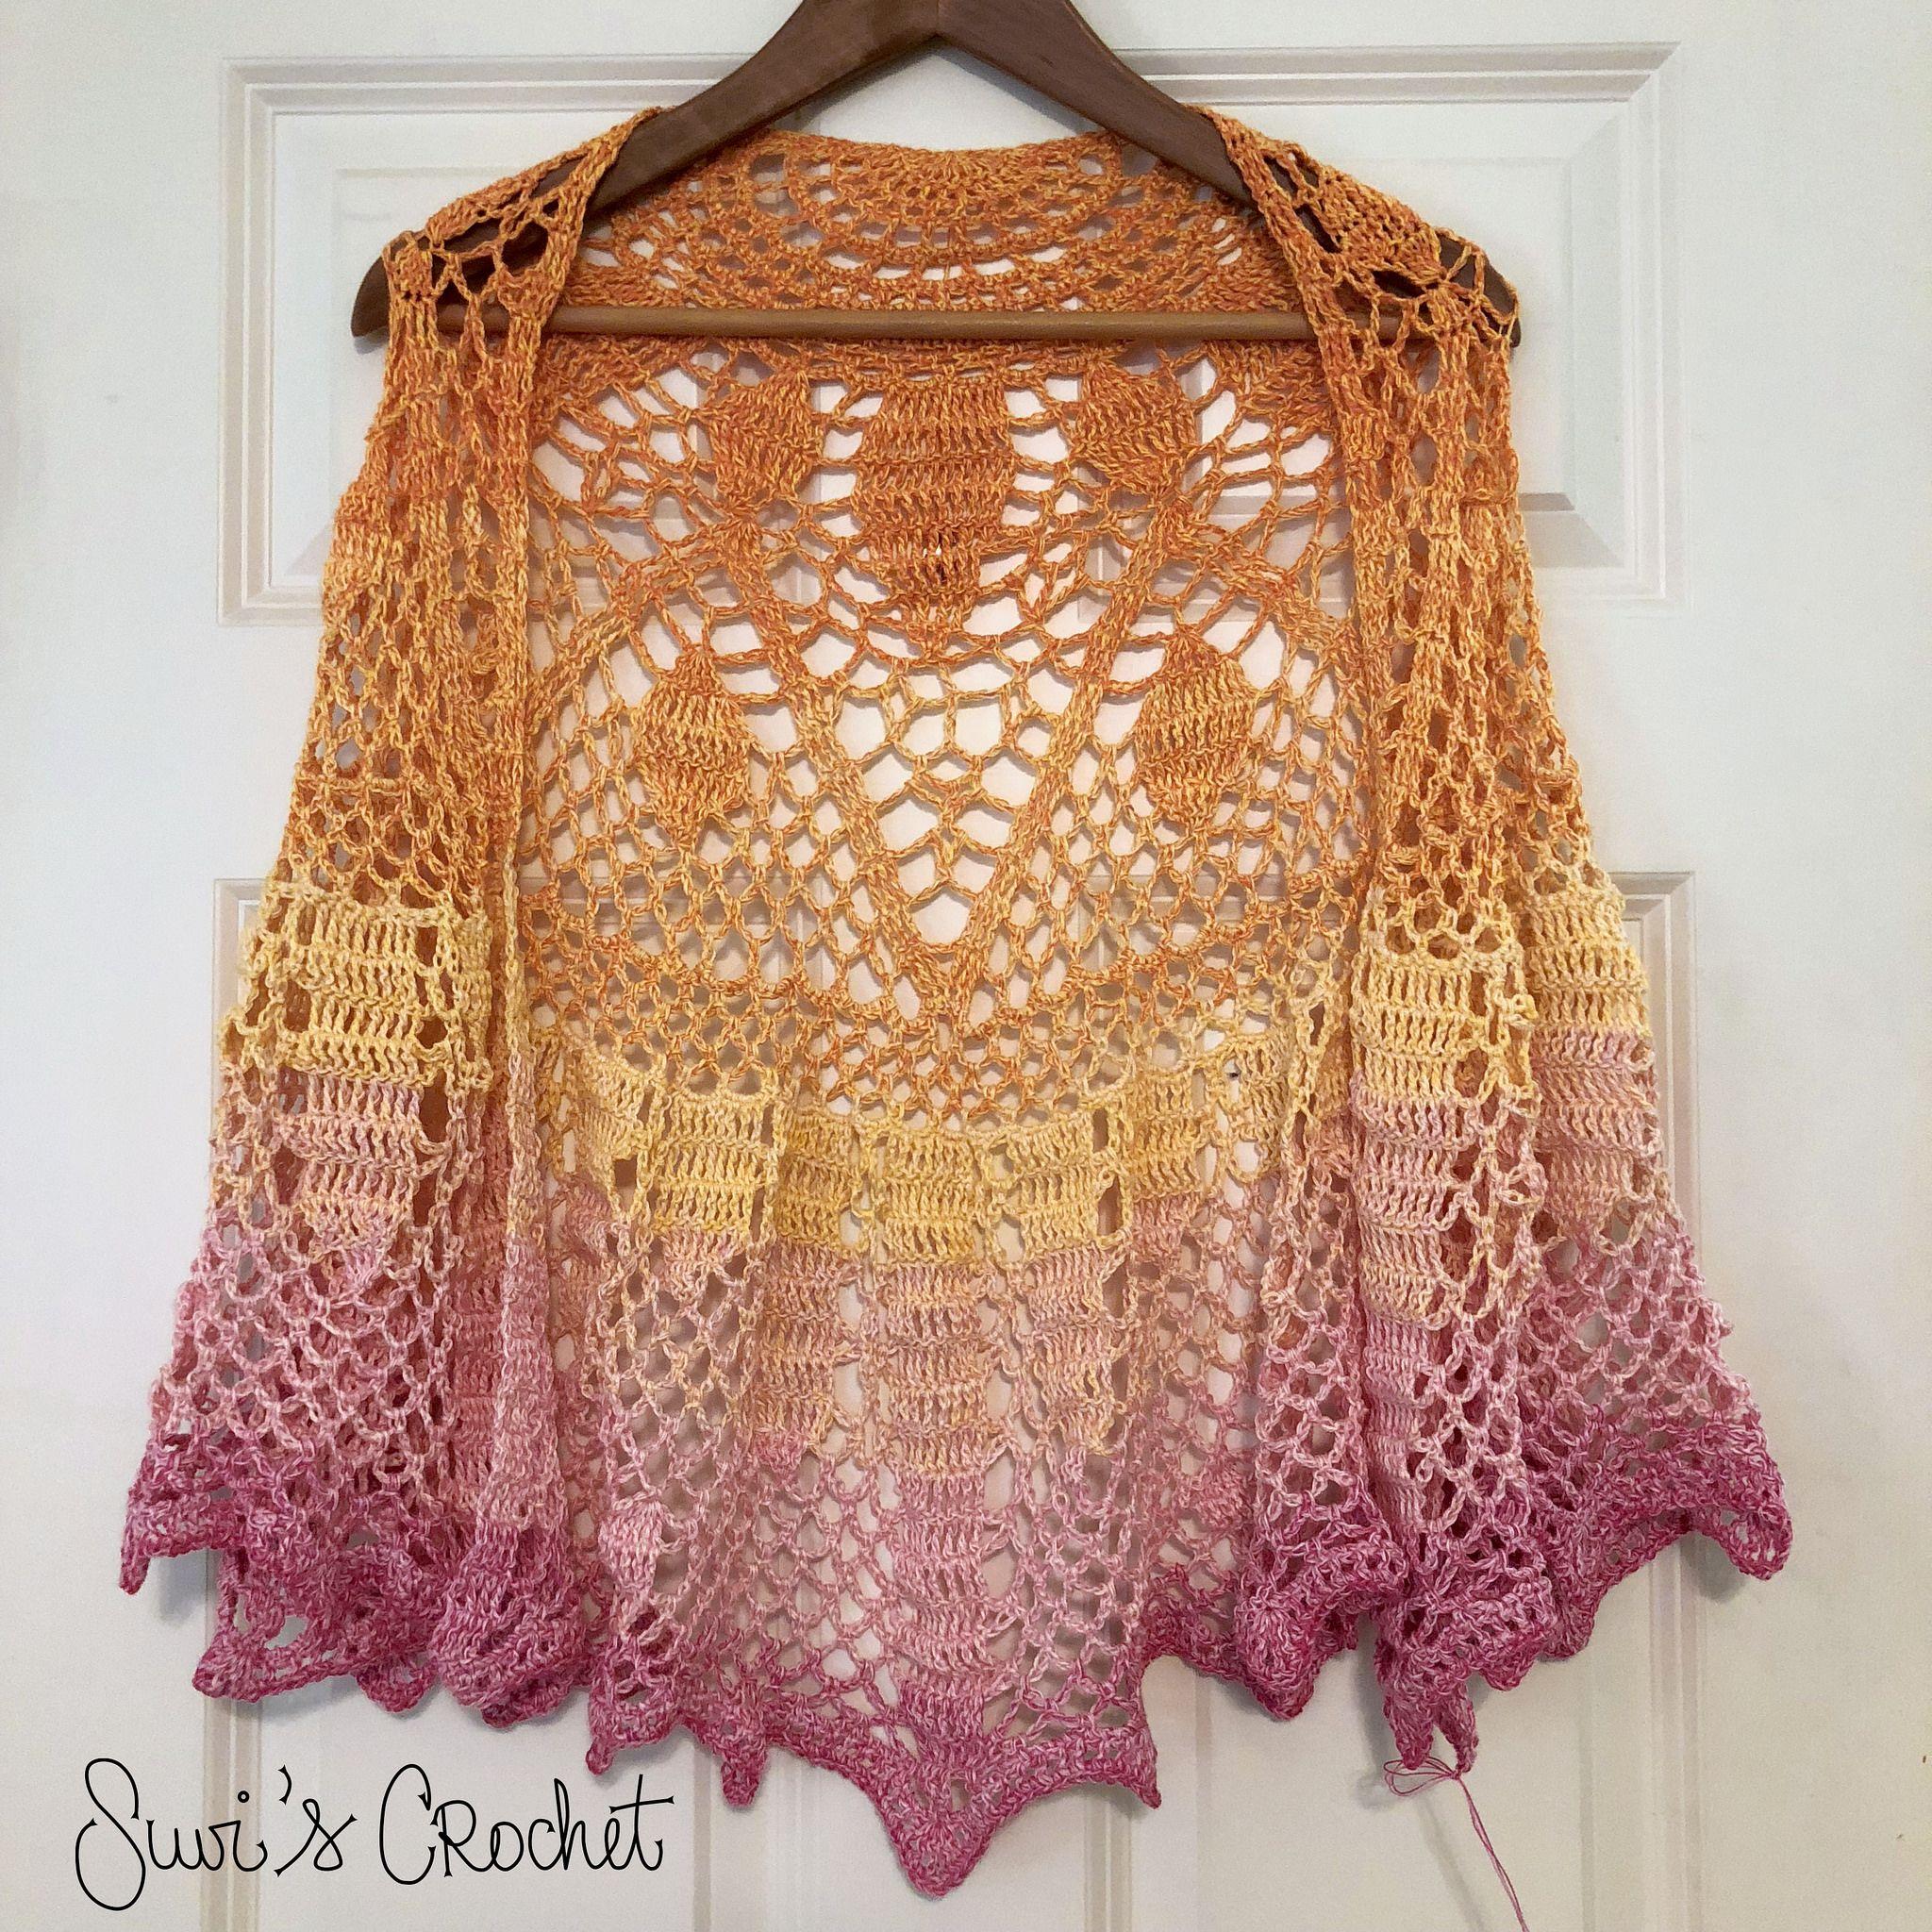 Art Deco Sunburst Shawl Crochet Fashion Free Crochet Pattern Knit Patterns